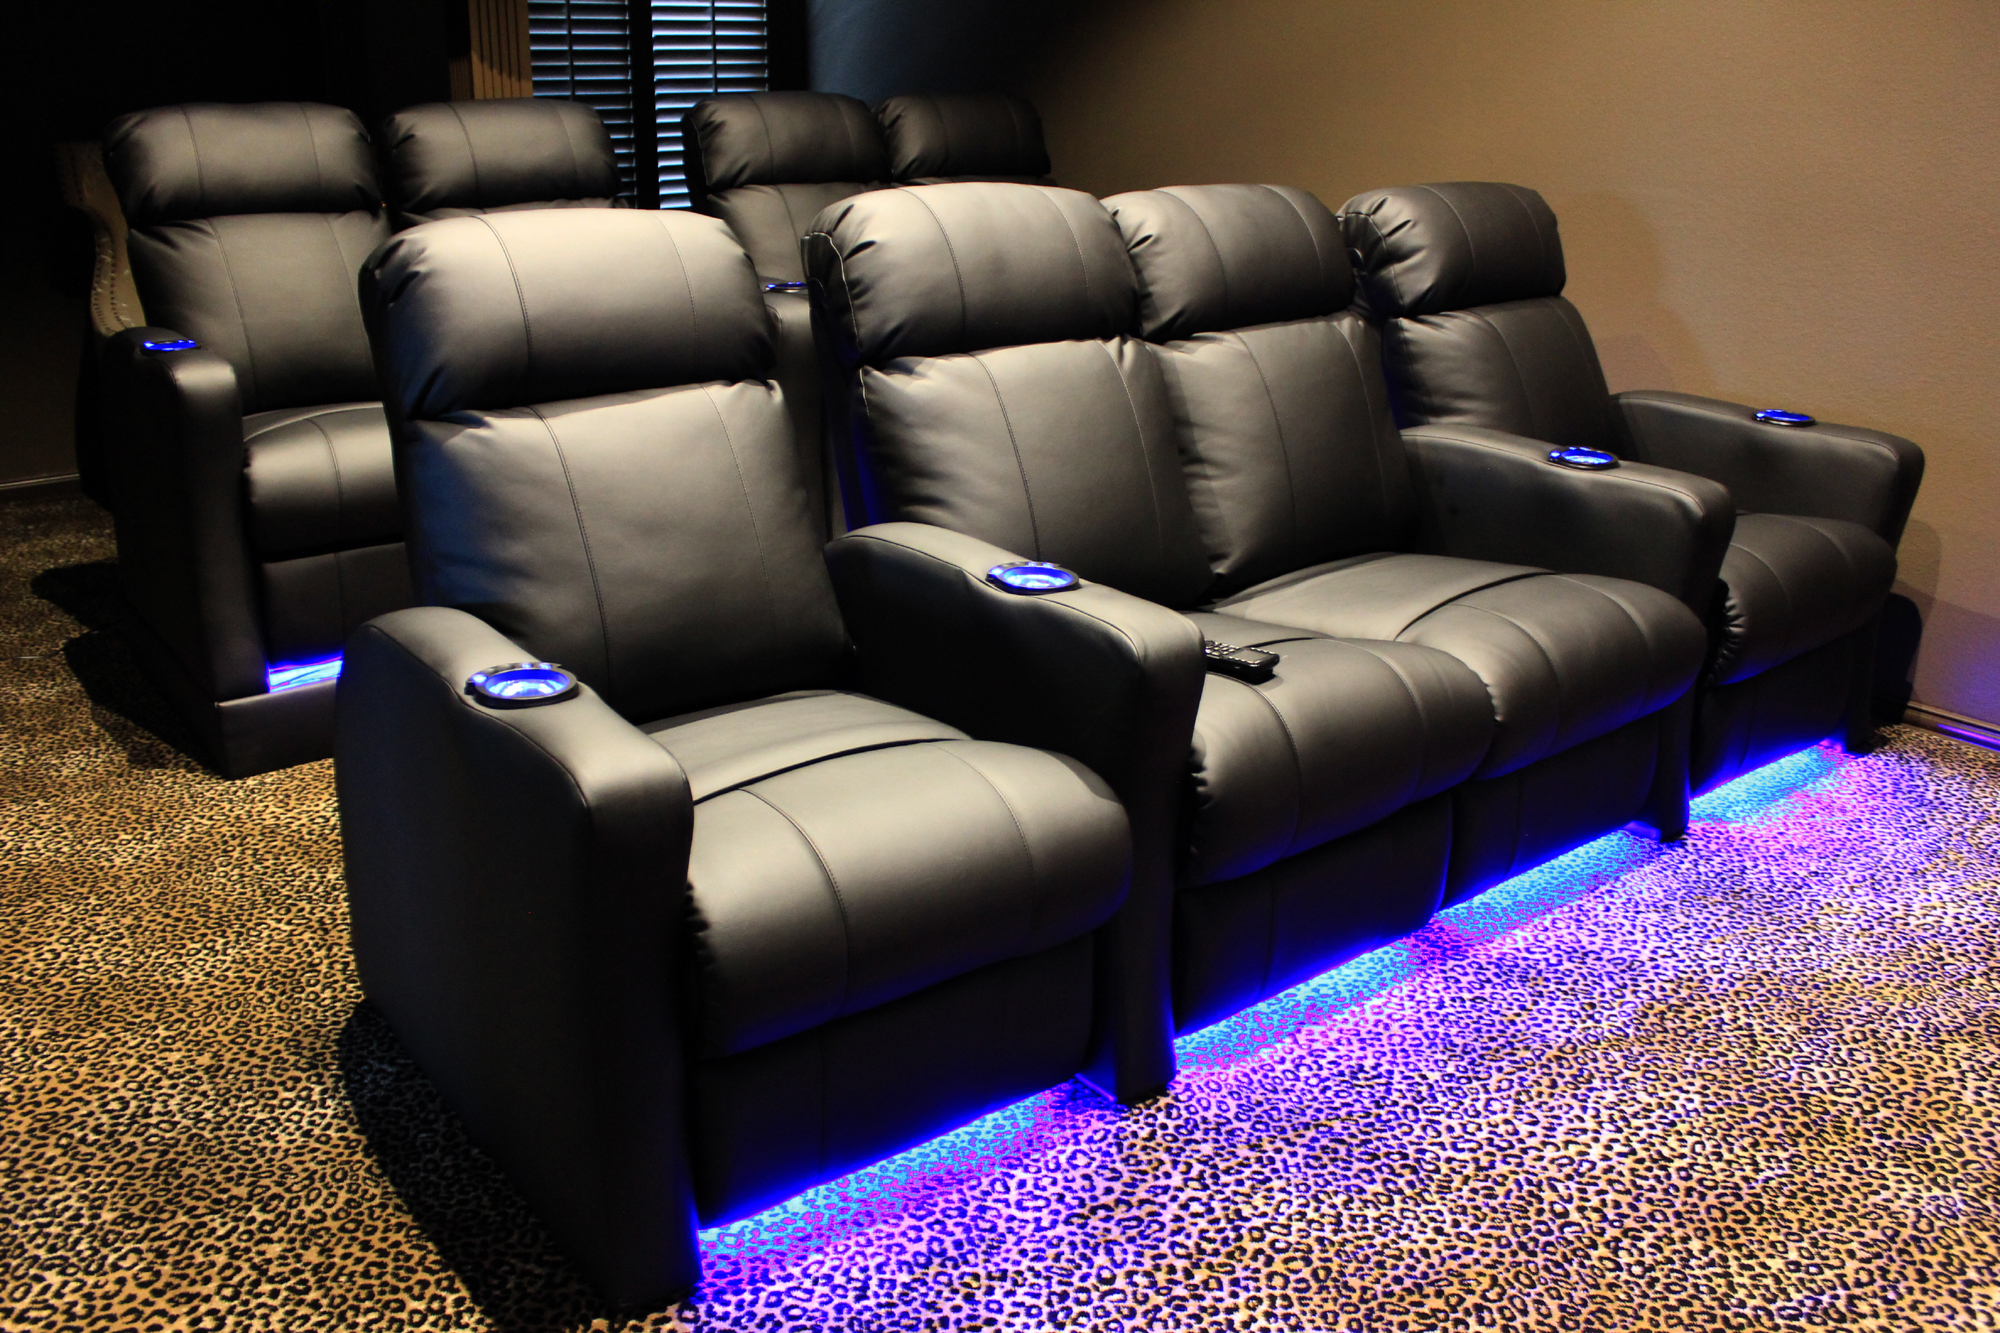 Media Room Seating Furniture. Palliser Leather Home